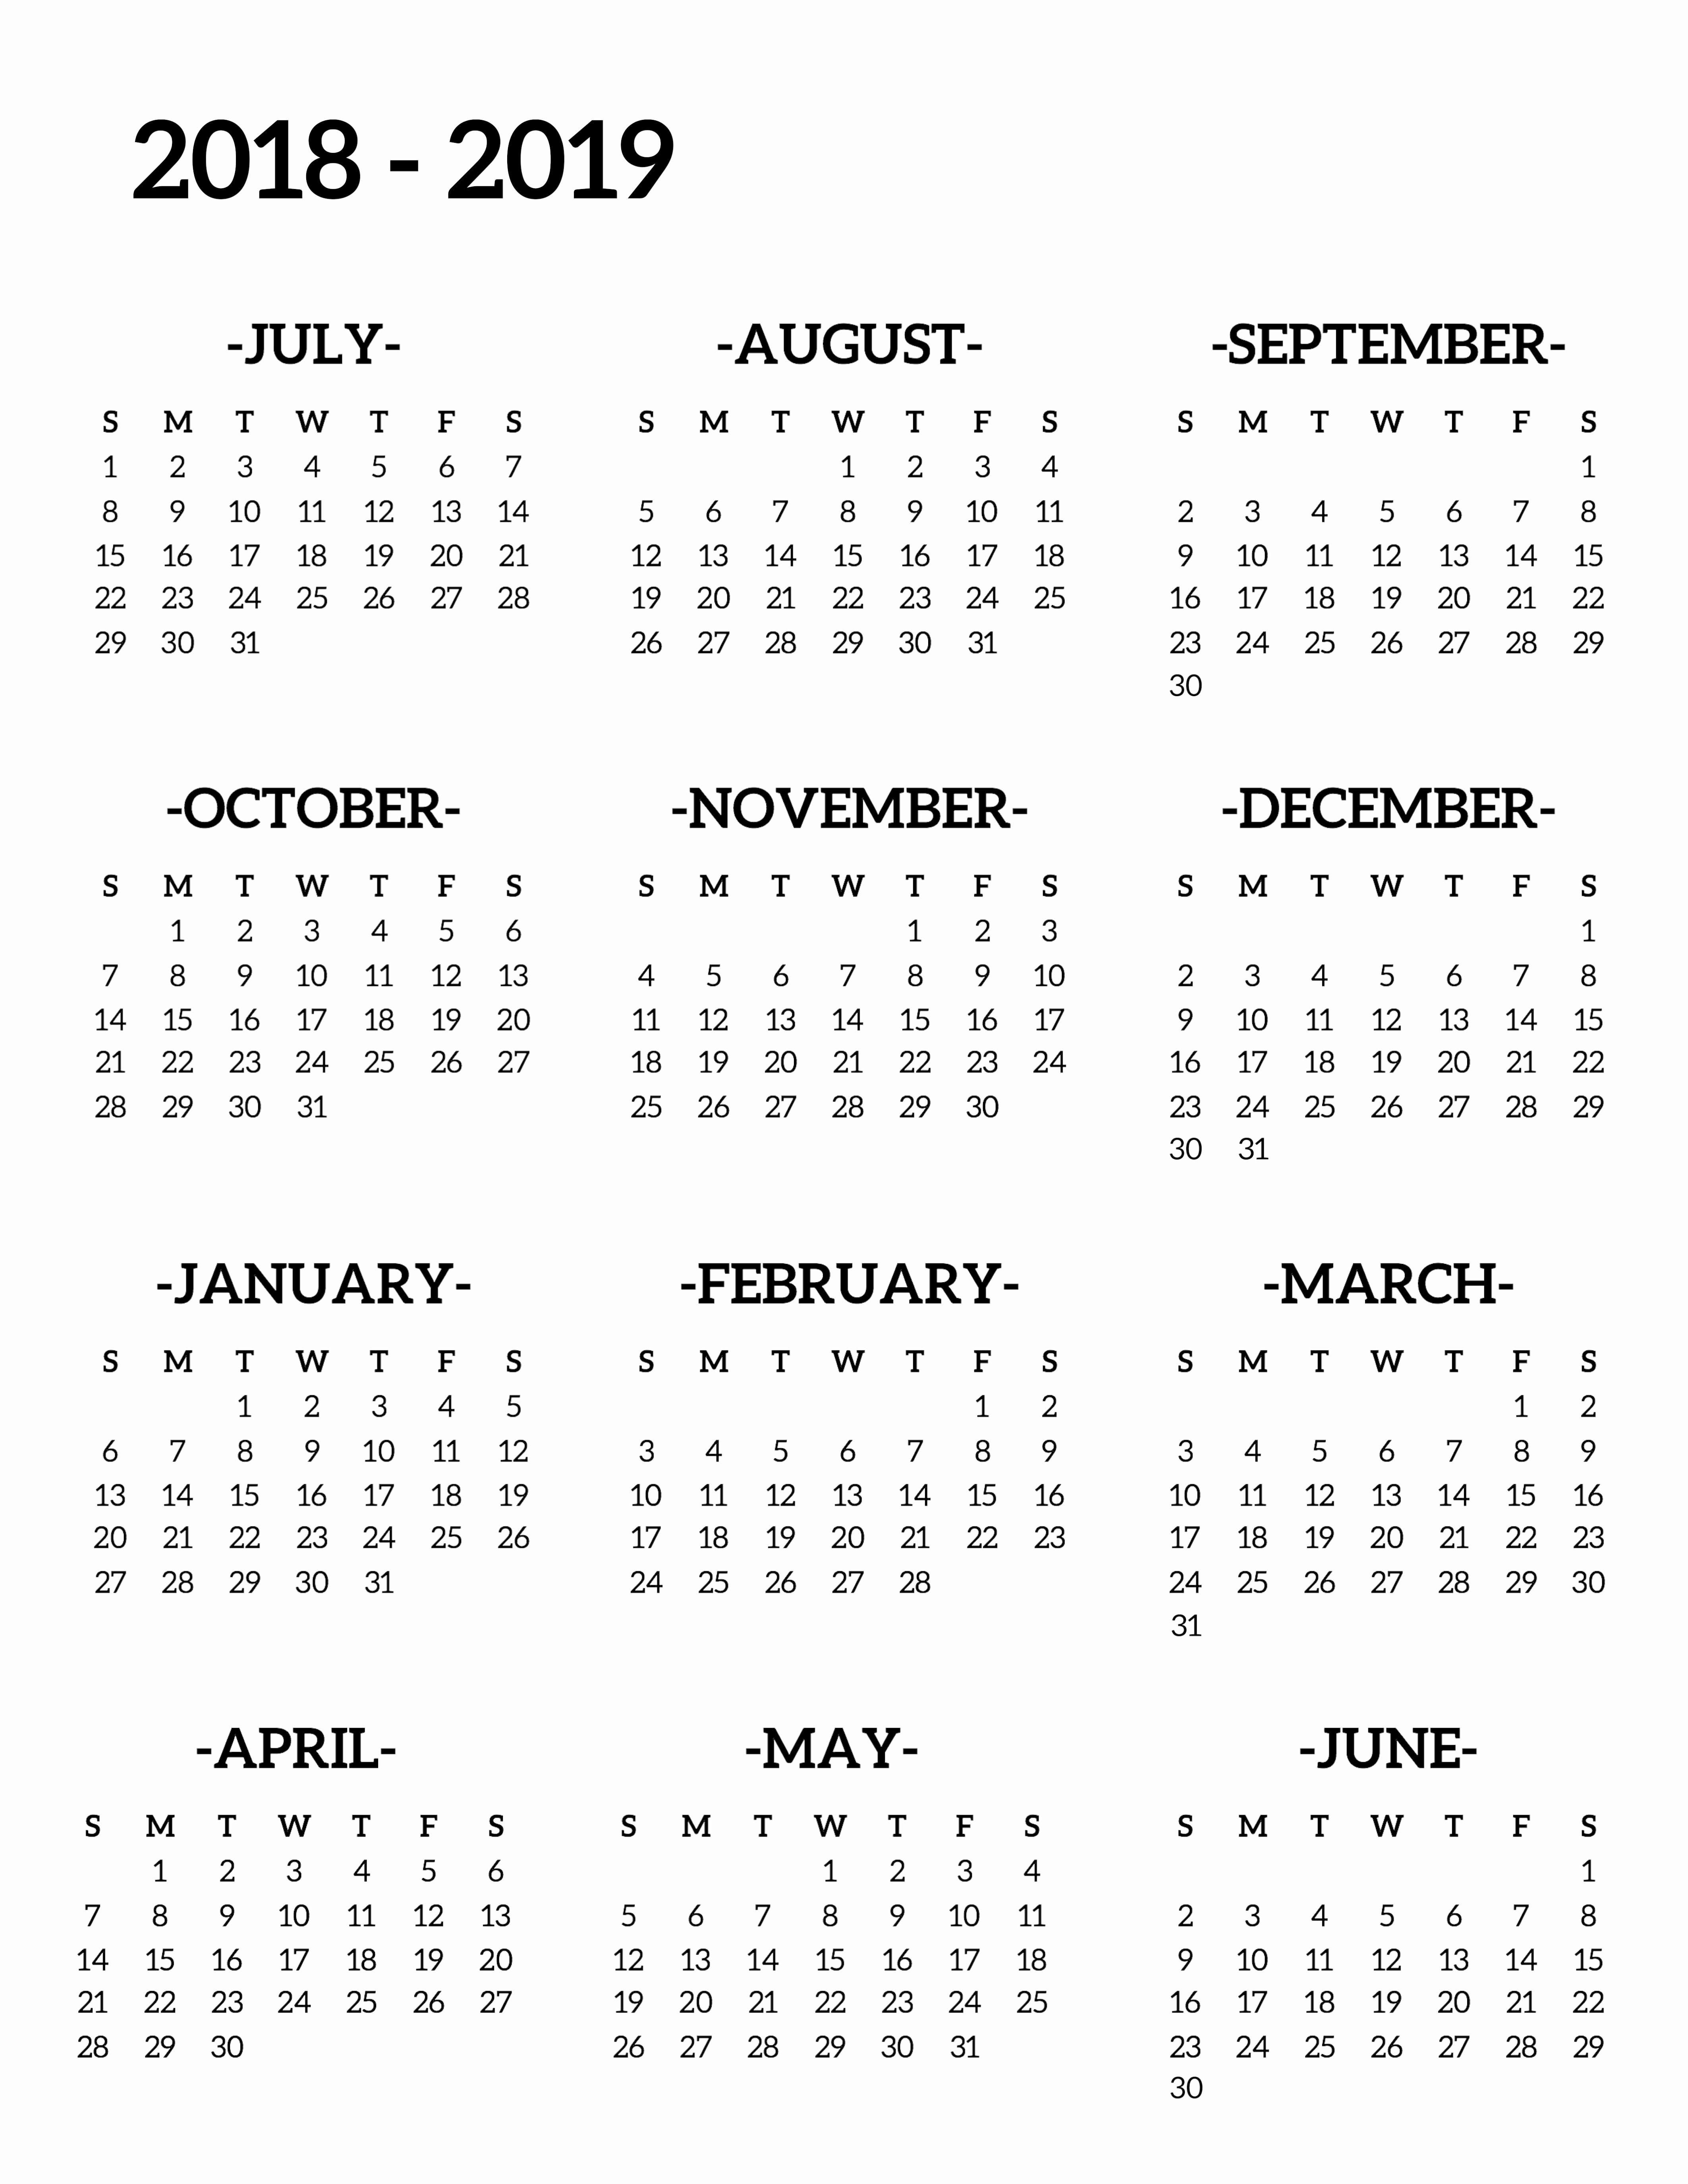 Printable Calendar 2018 and 2019 Awesome 2018 2019 School Calendar Printable Free Template Paper